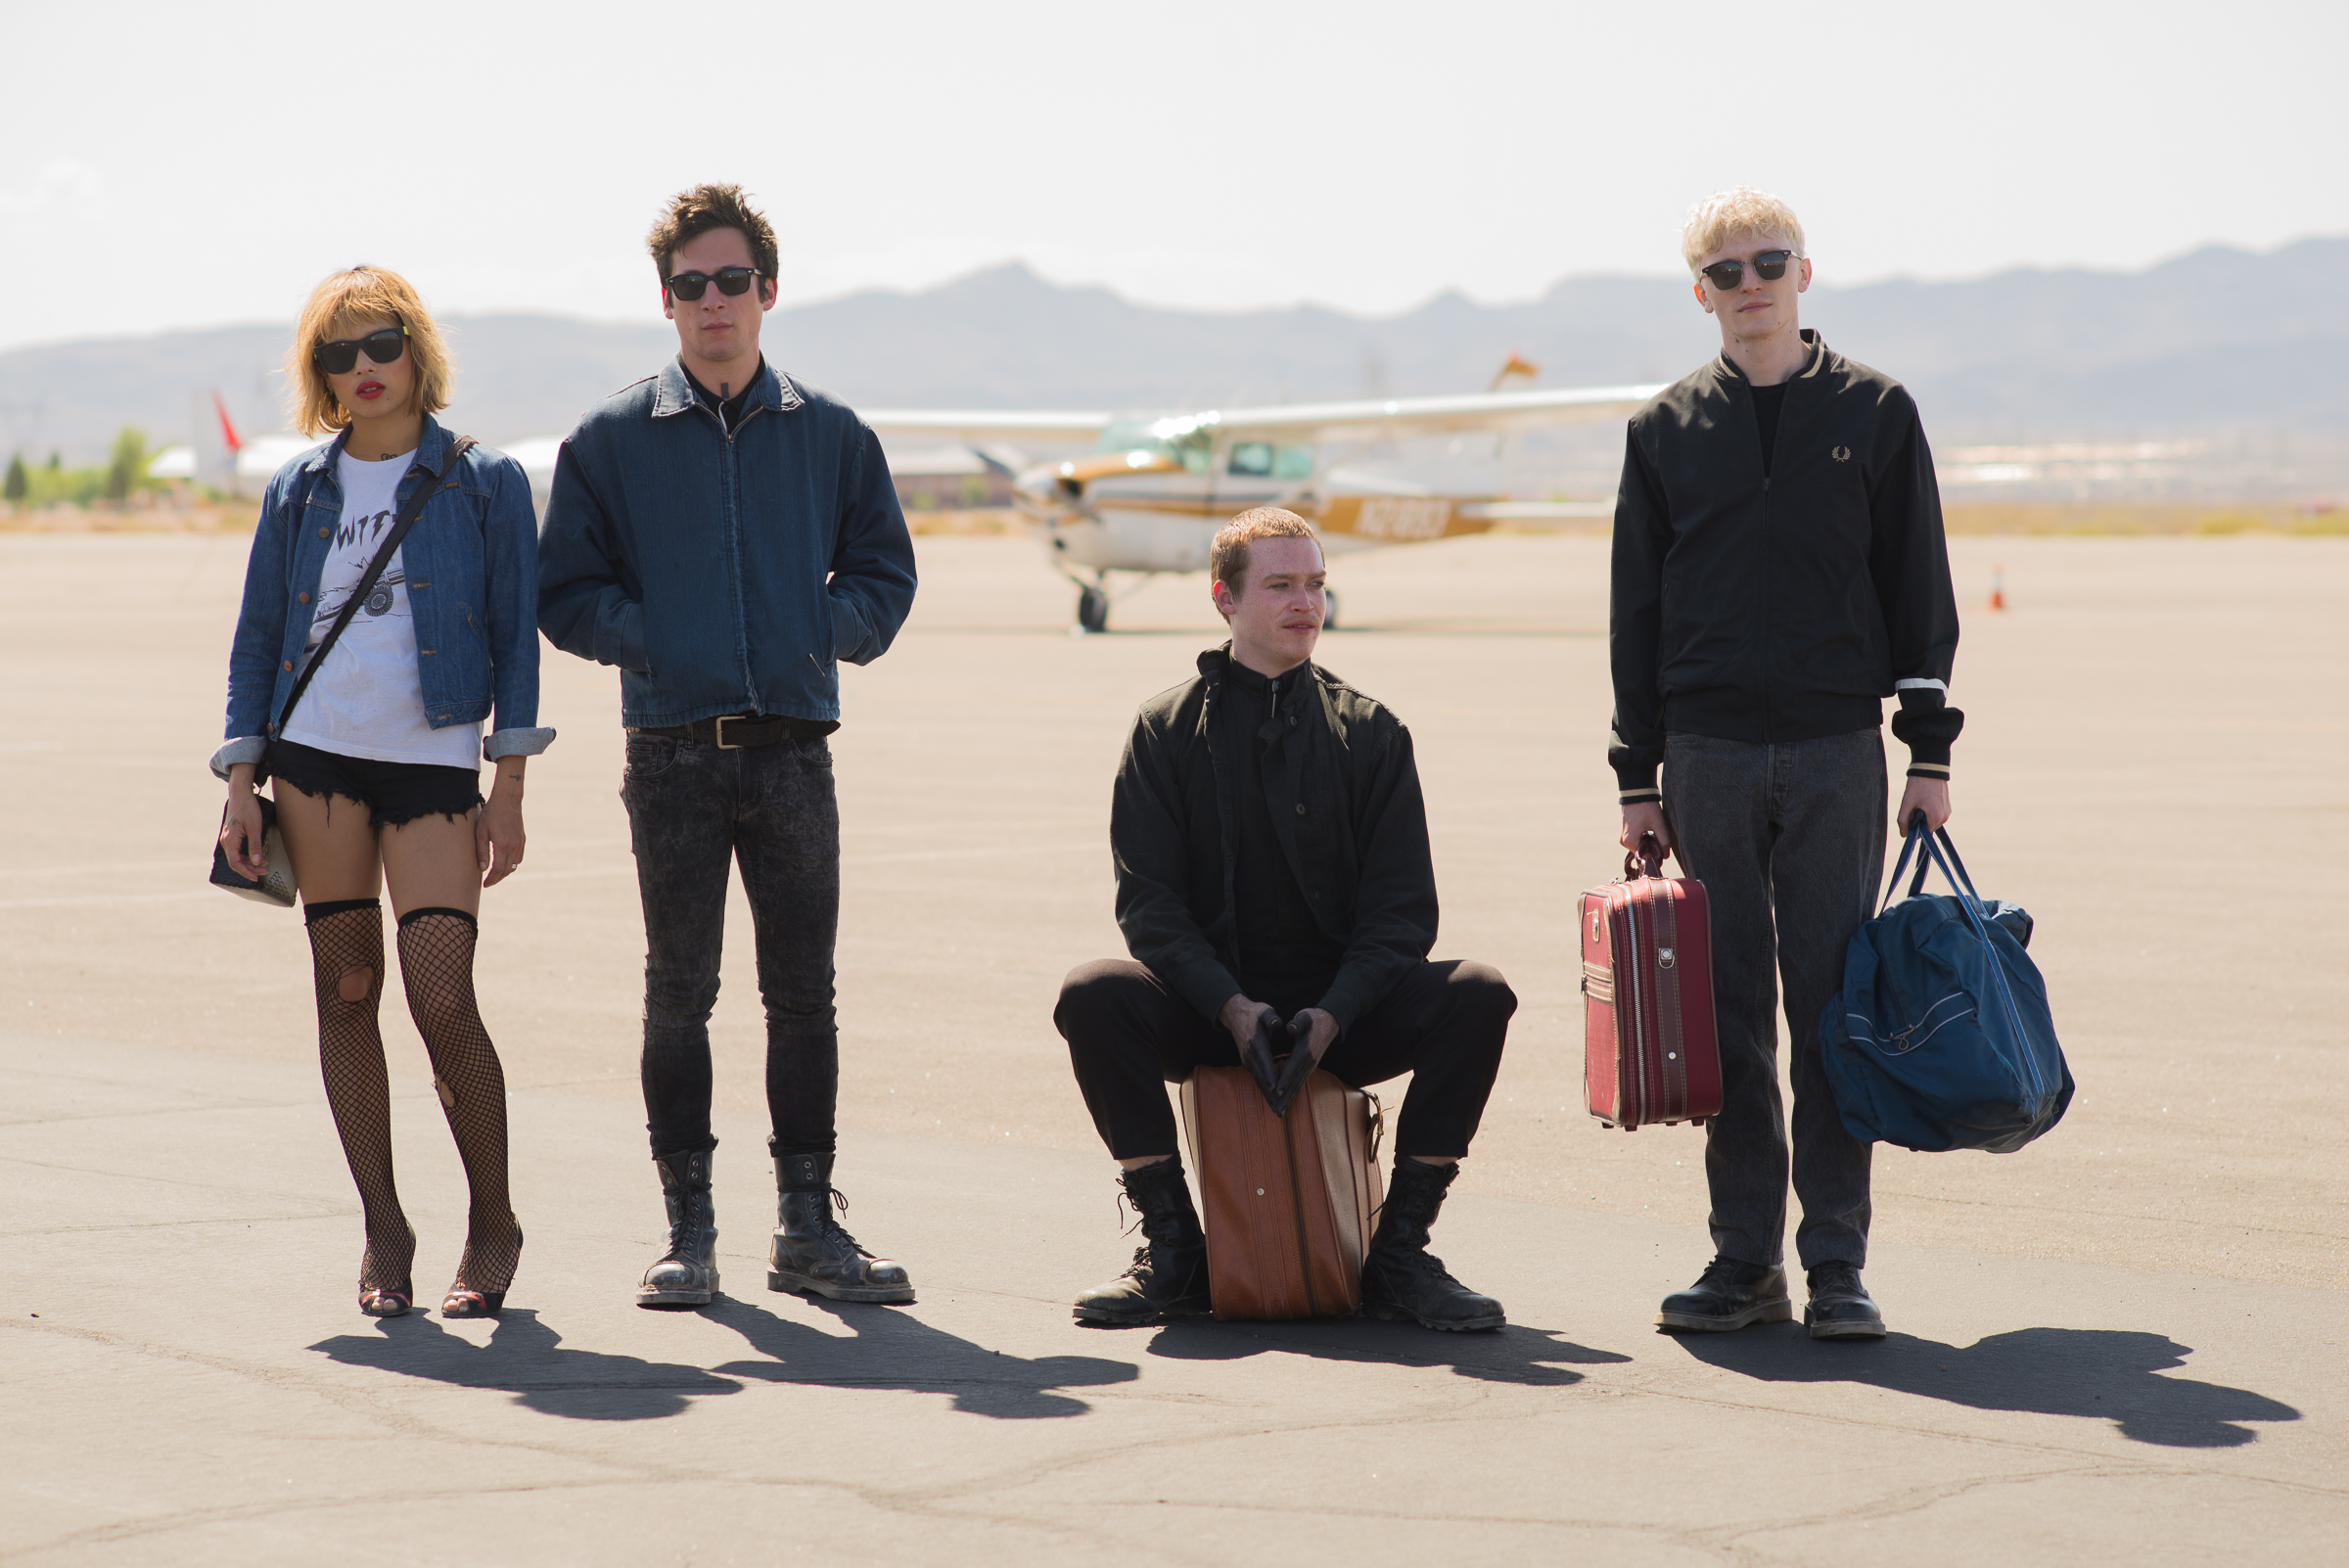 Frank Dillane, Jeremy Allen White, Zoë Kravitz, and Caleb Landry Jones in Viena and the Fantomes (2020)